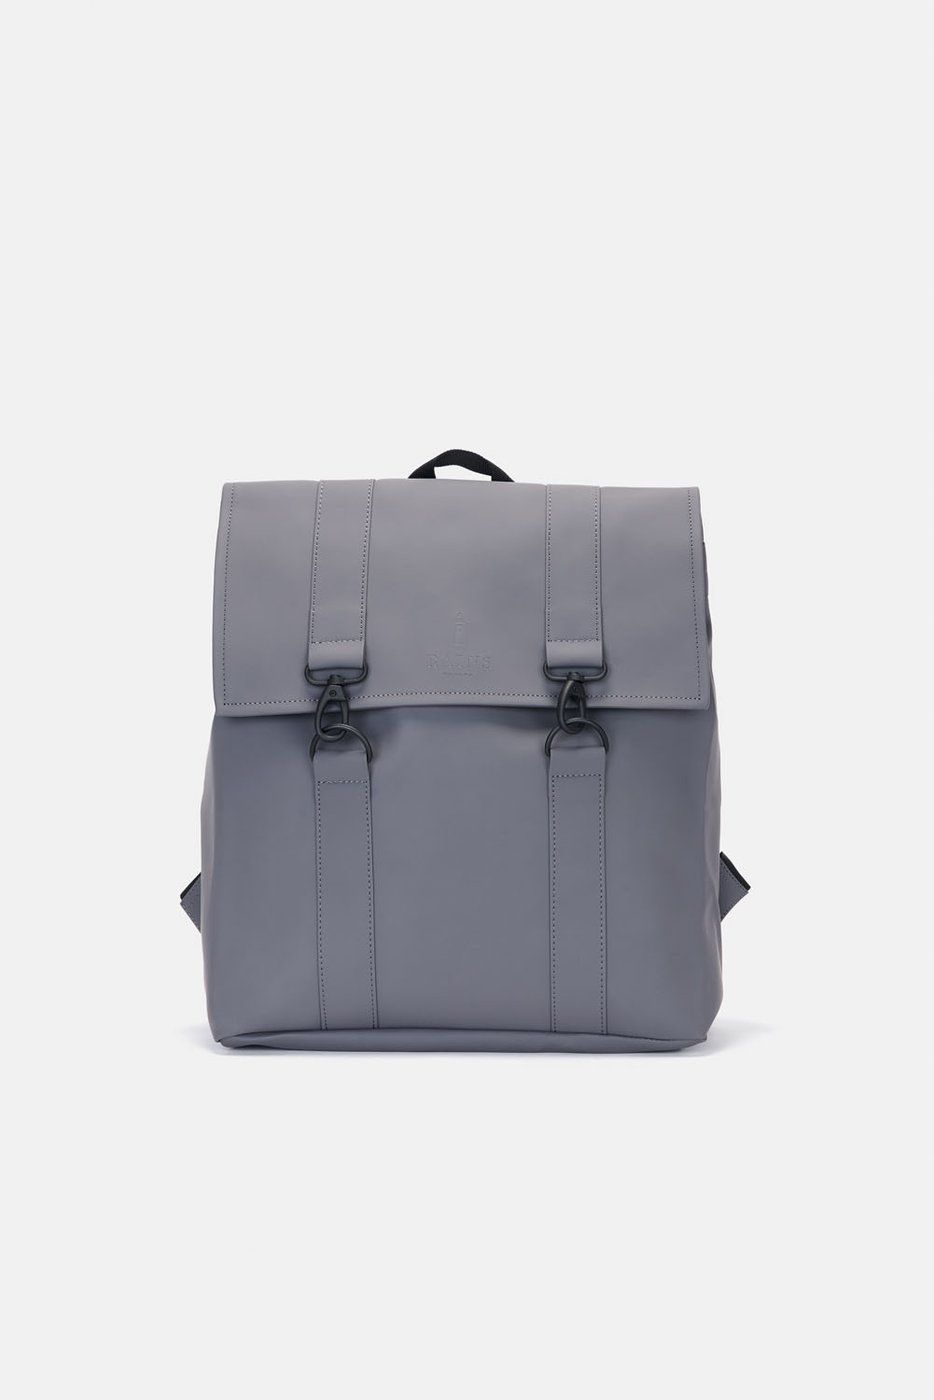 Msn Bag L I K E Backpacks Pinterest Backpacks Rain And Weather